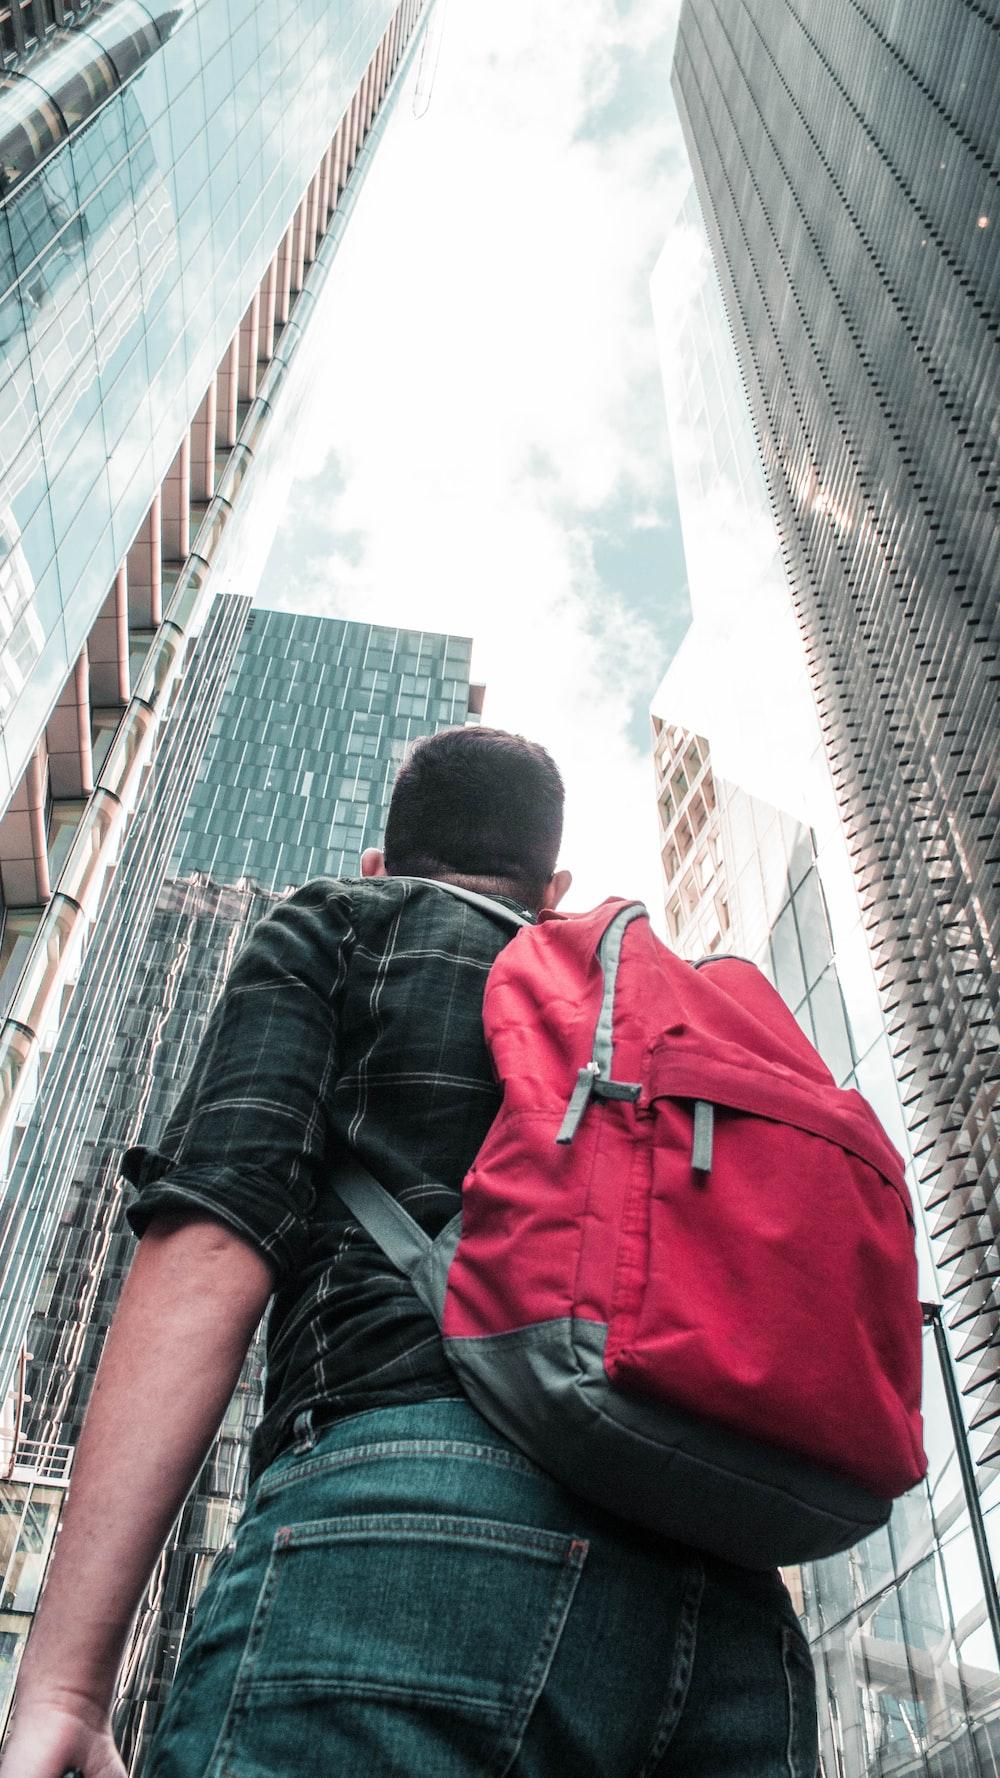 man standing between high-rise buildings